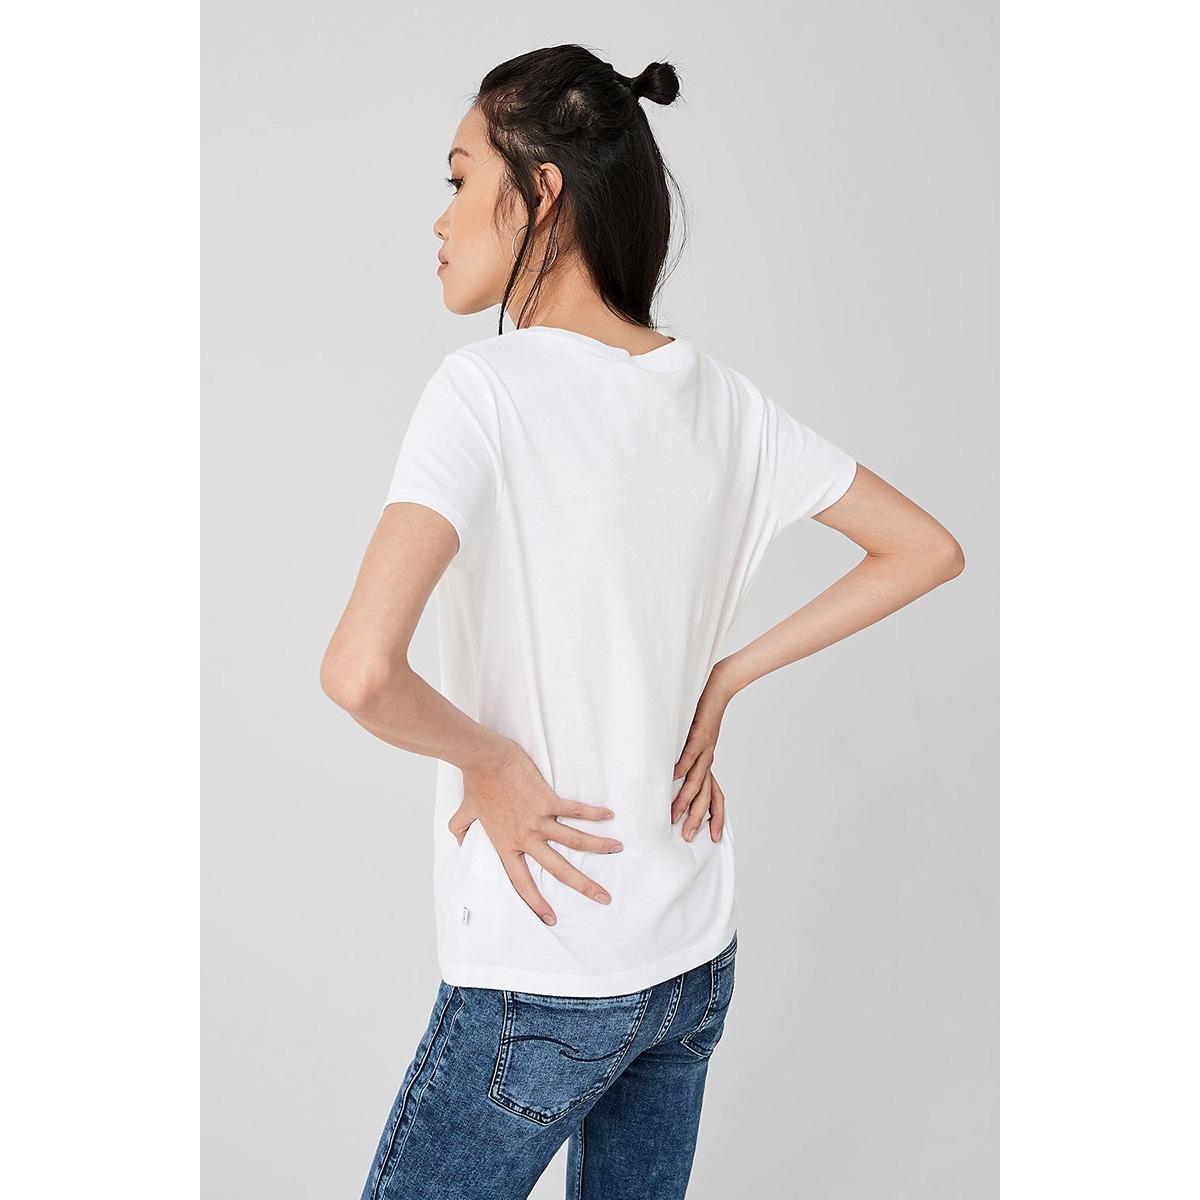 t shirt 41909325479 q/s designed by t-shirt 01d0